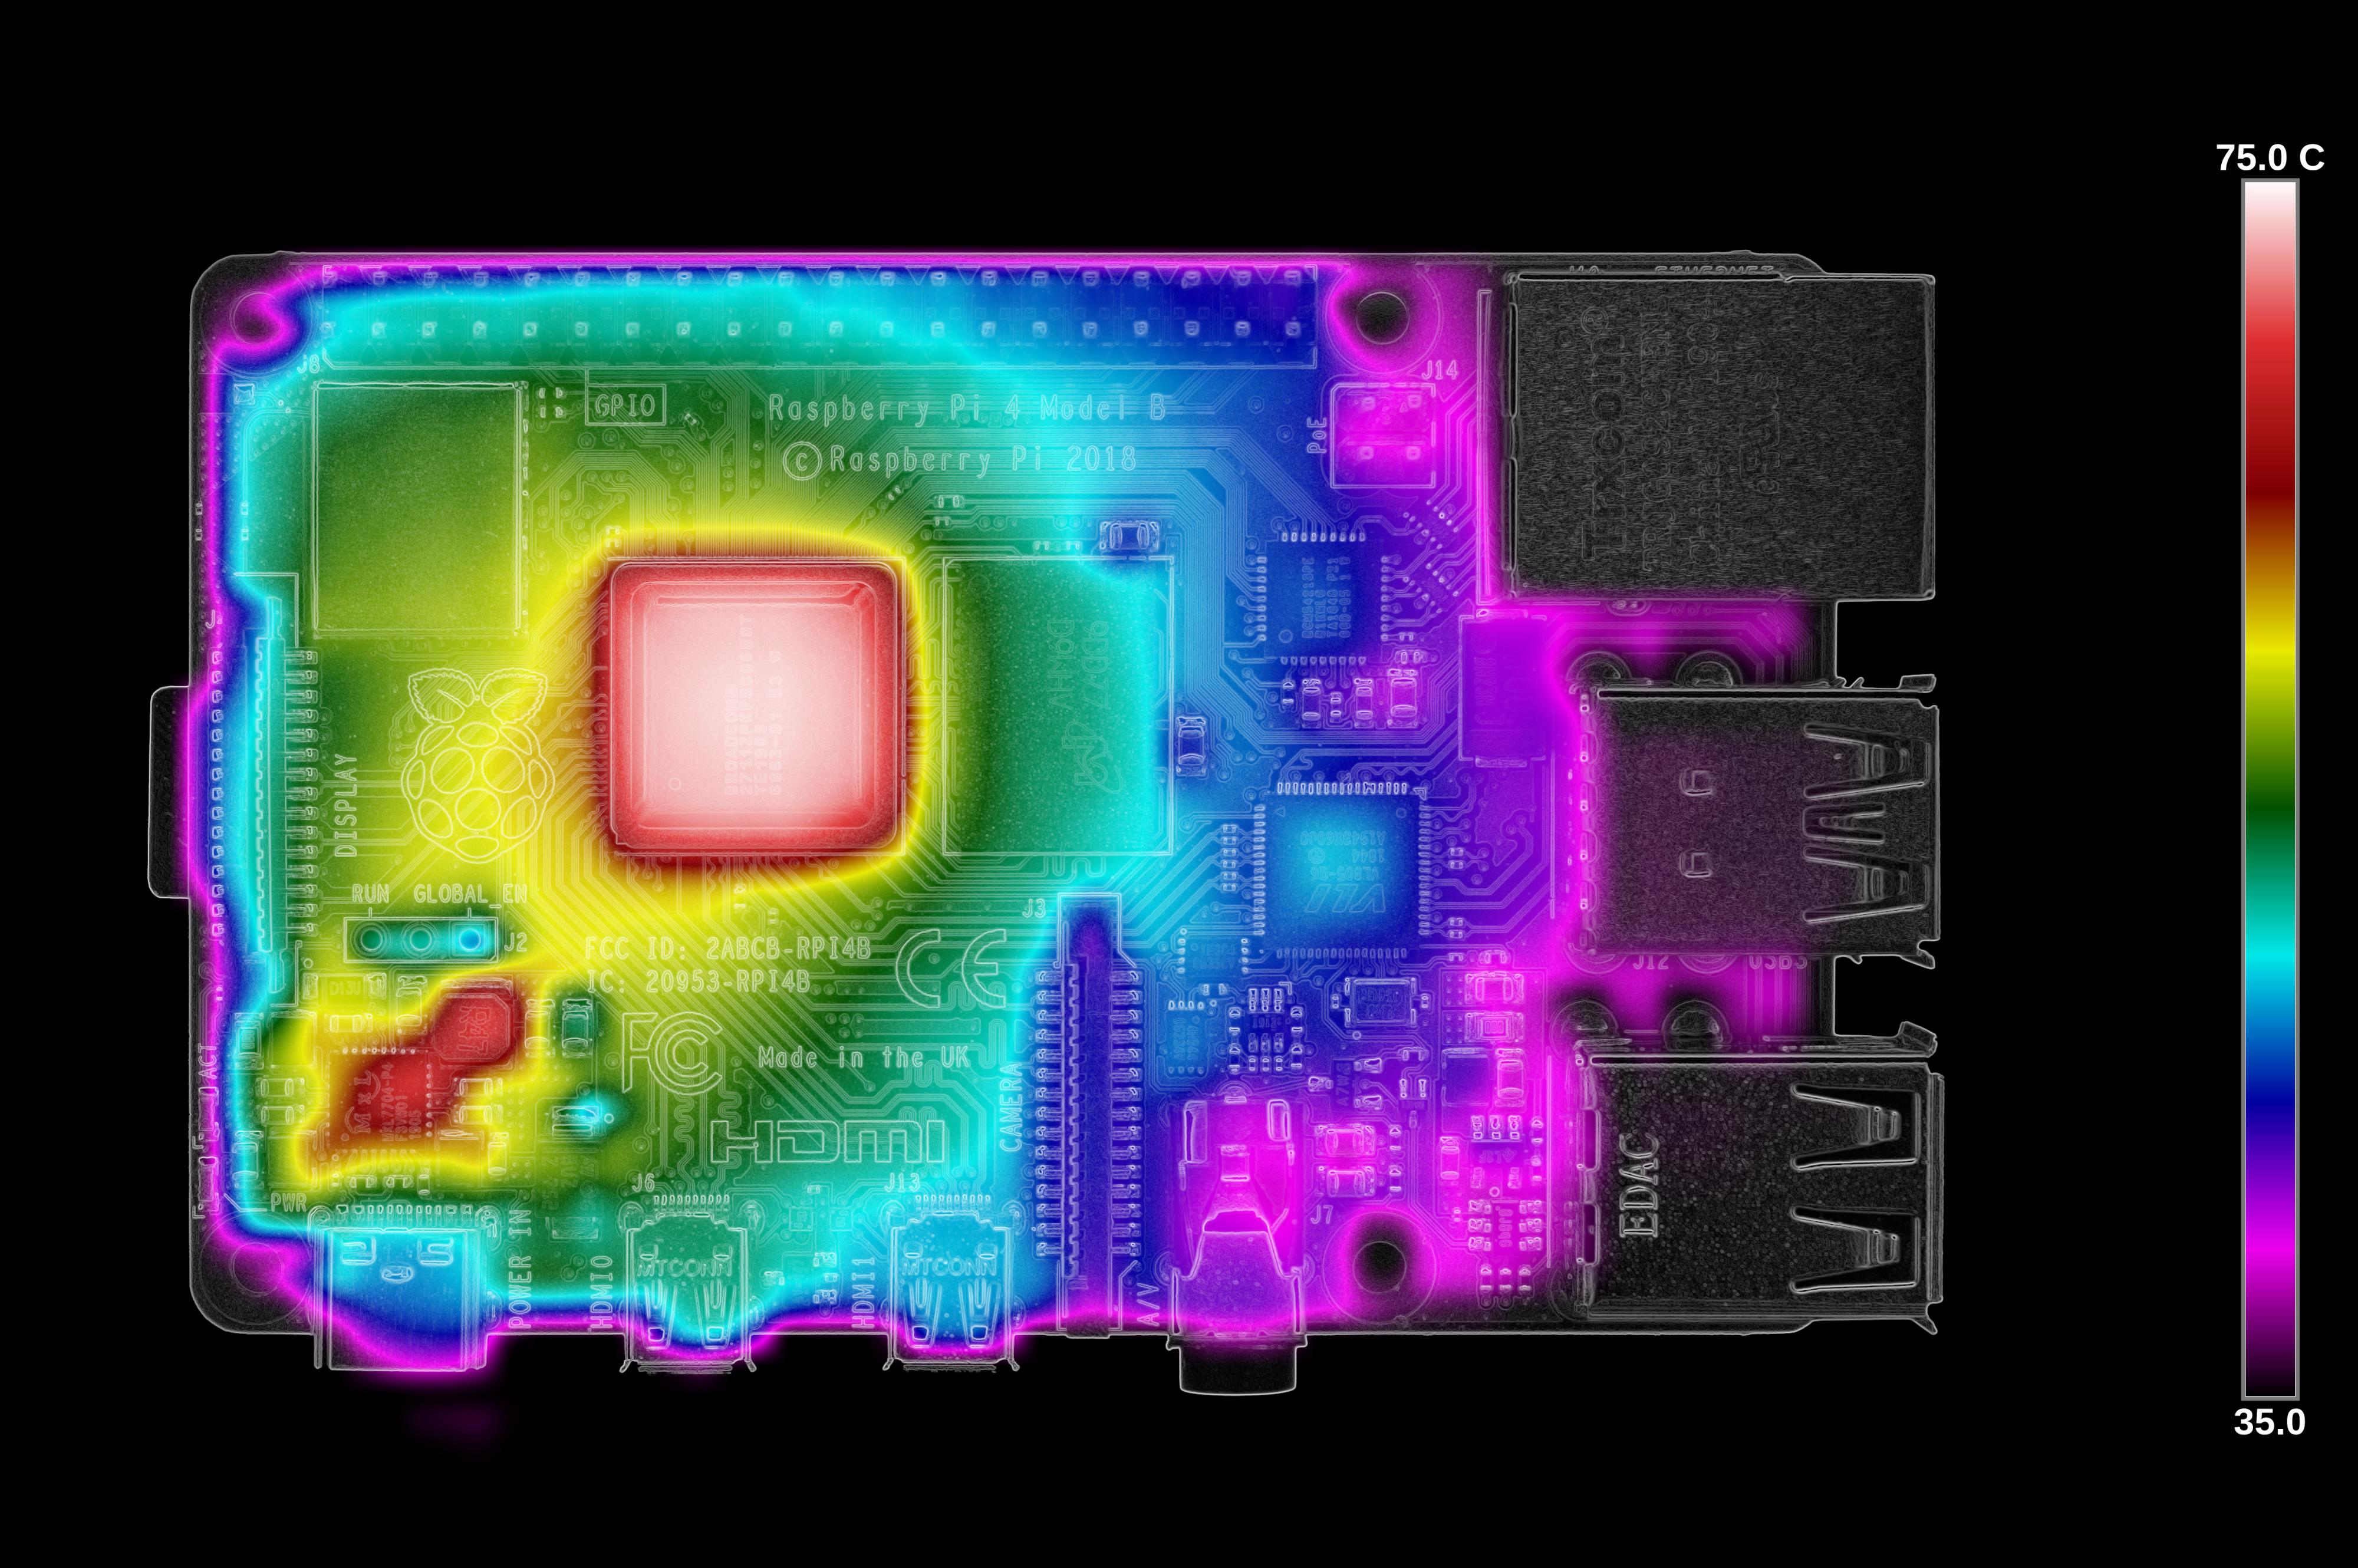 Тестирование Raspberry Pi 4 на нагрев - 15